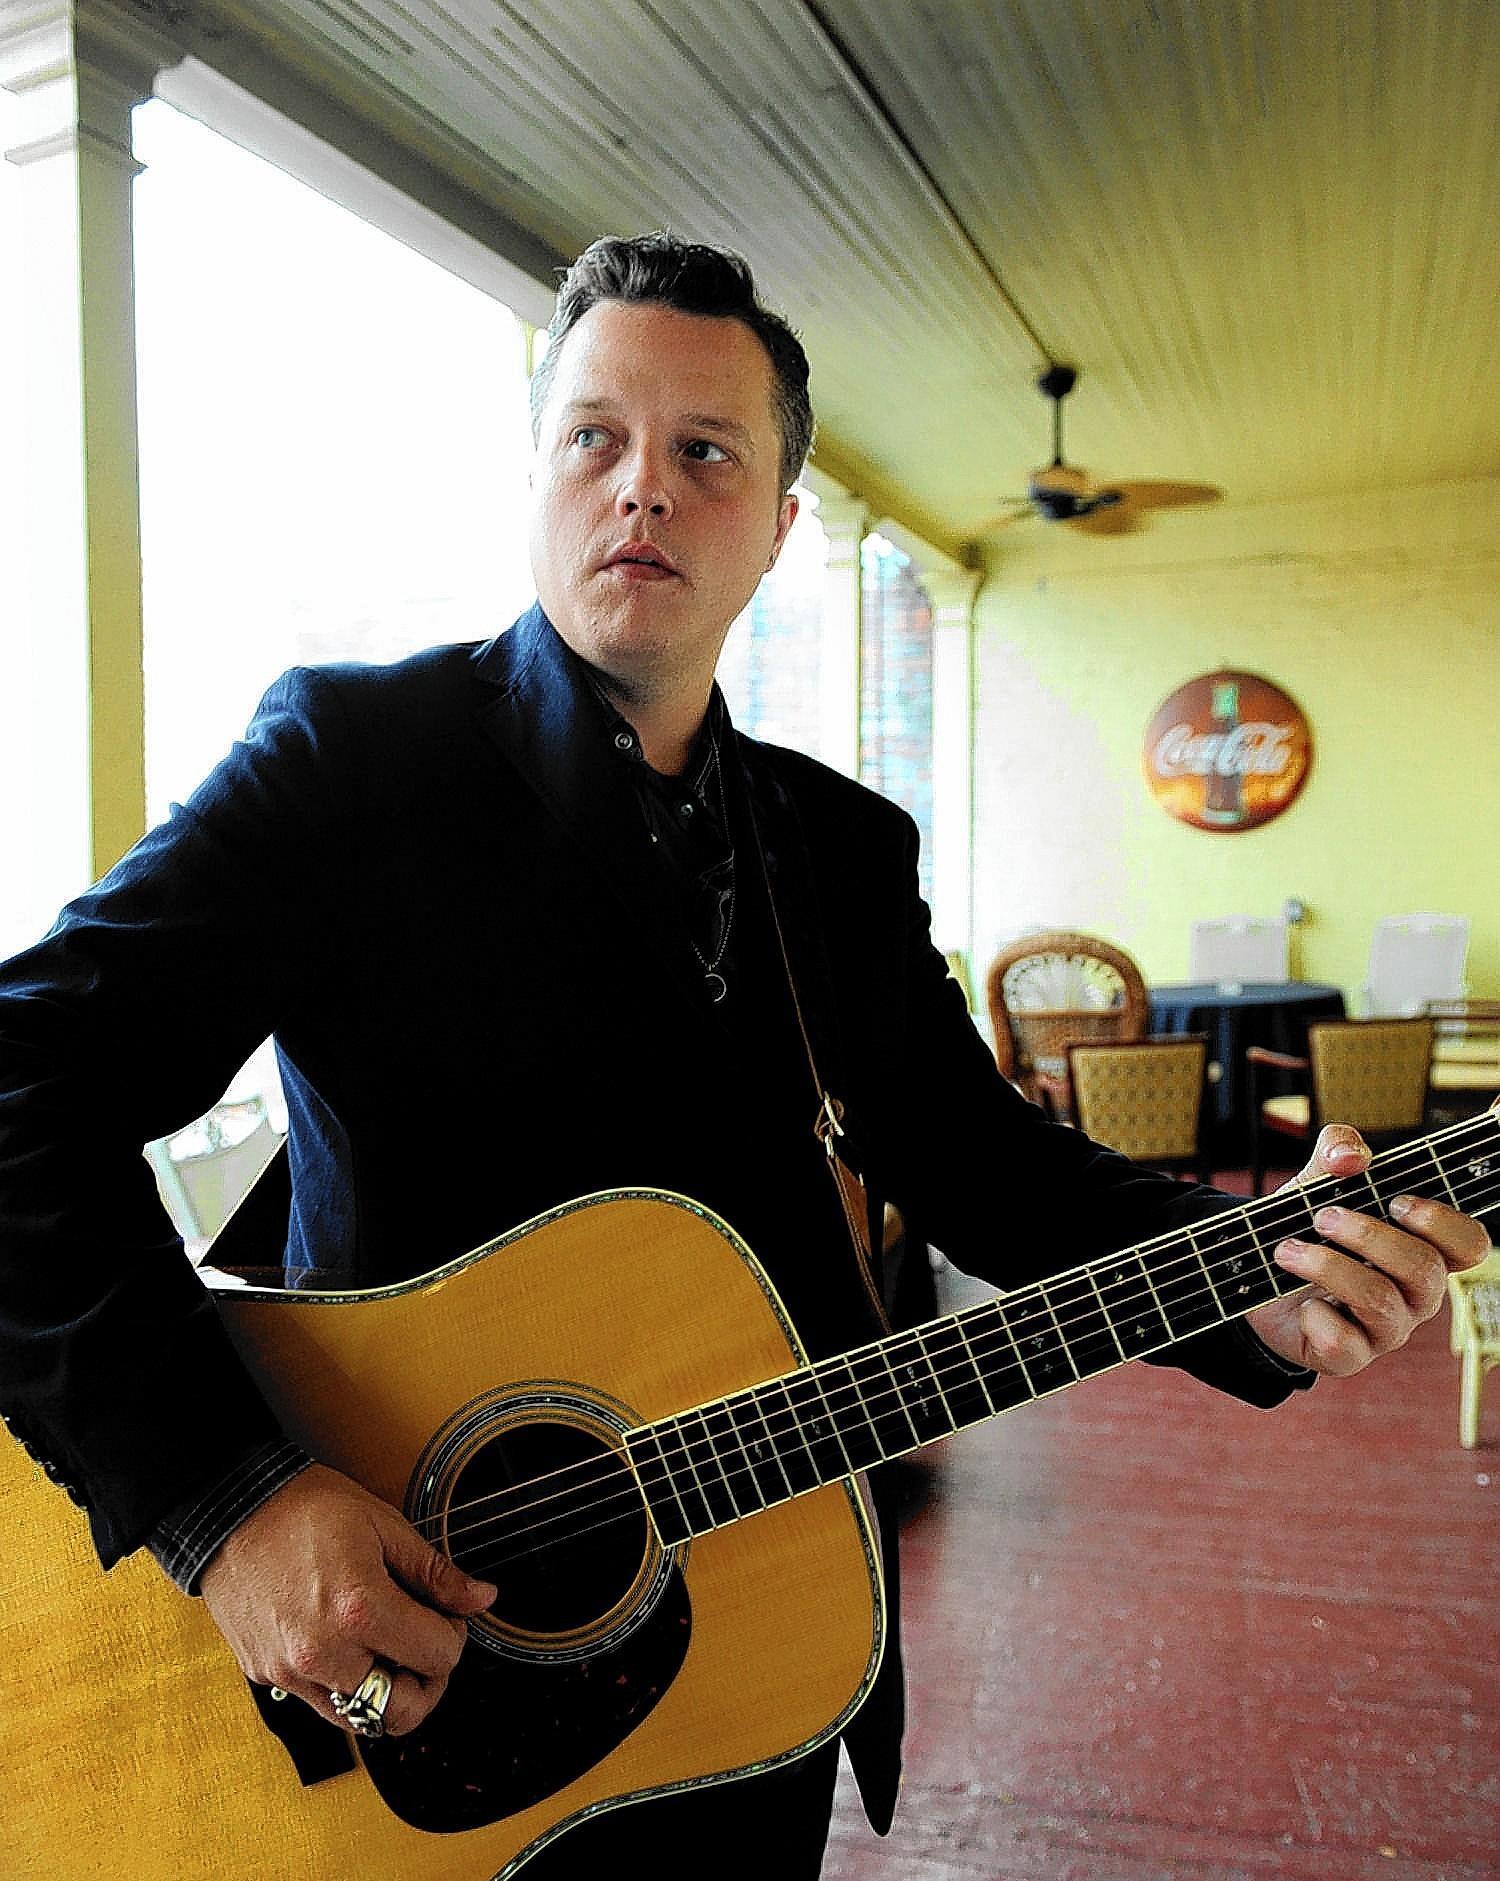 Jason Isbell, former frontman for Drive By Truckers, performs Sunday at Philadelphia Folk Festival.